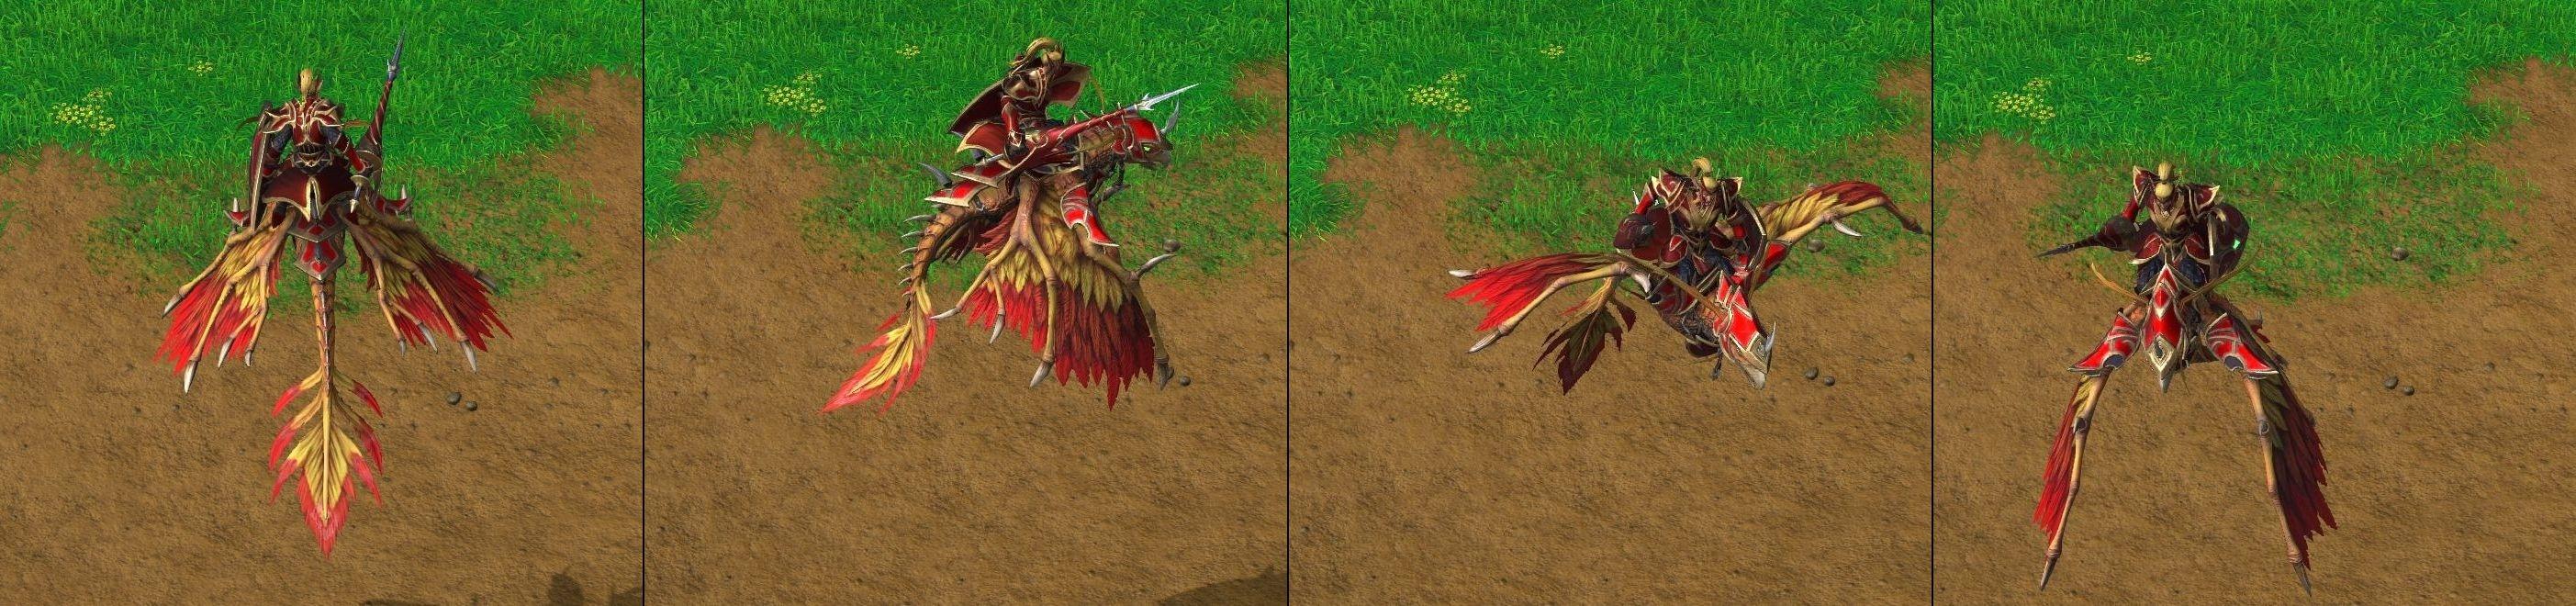 Warcraft Iii Reforged Human Unit Models Wowhead News